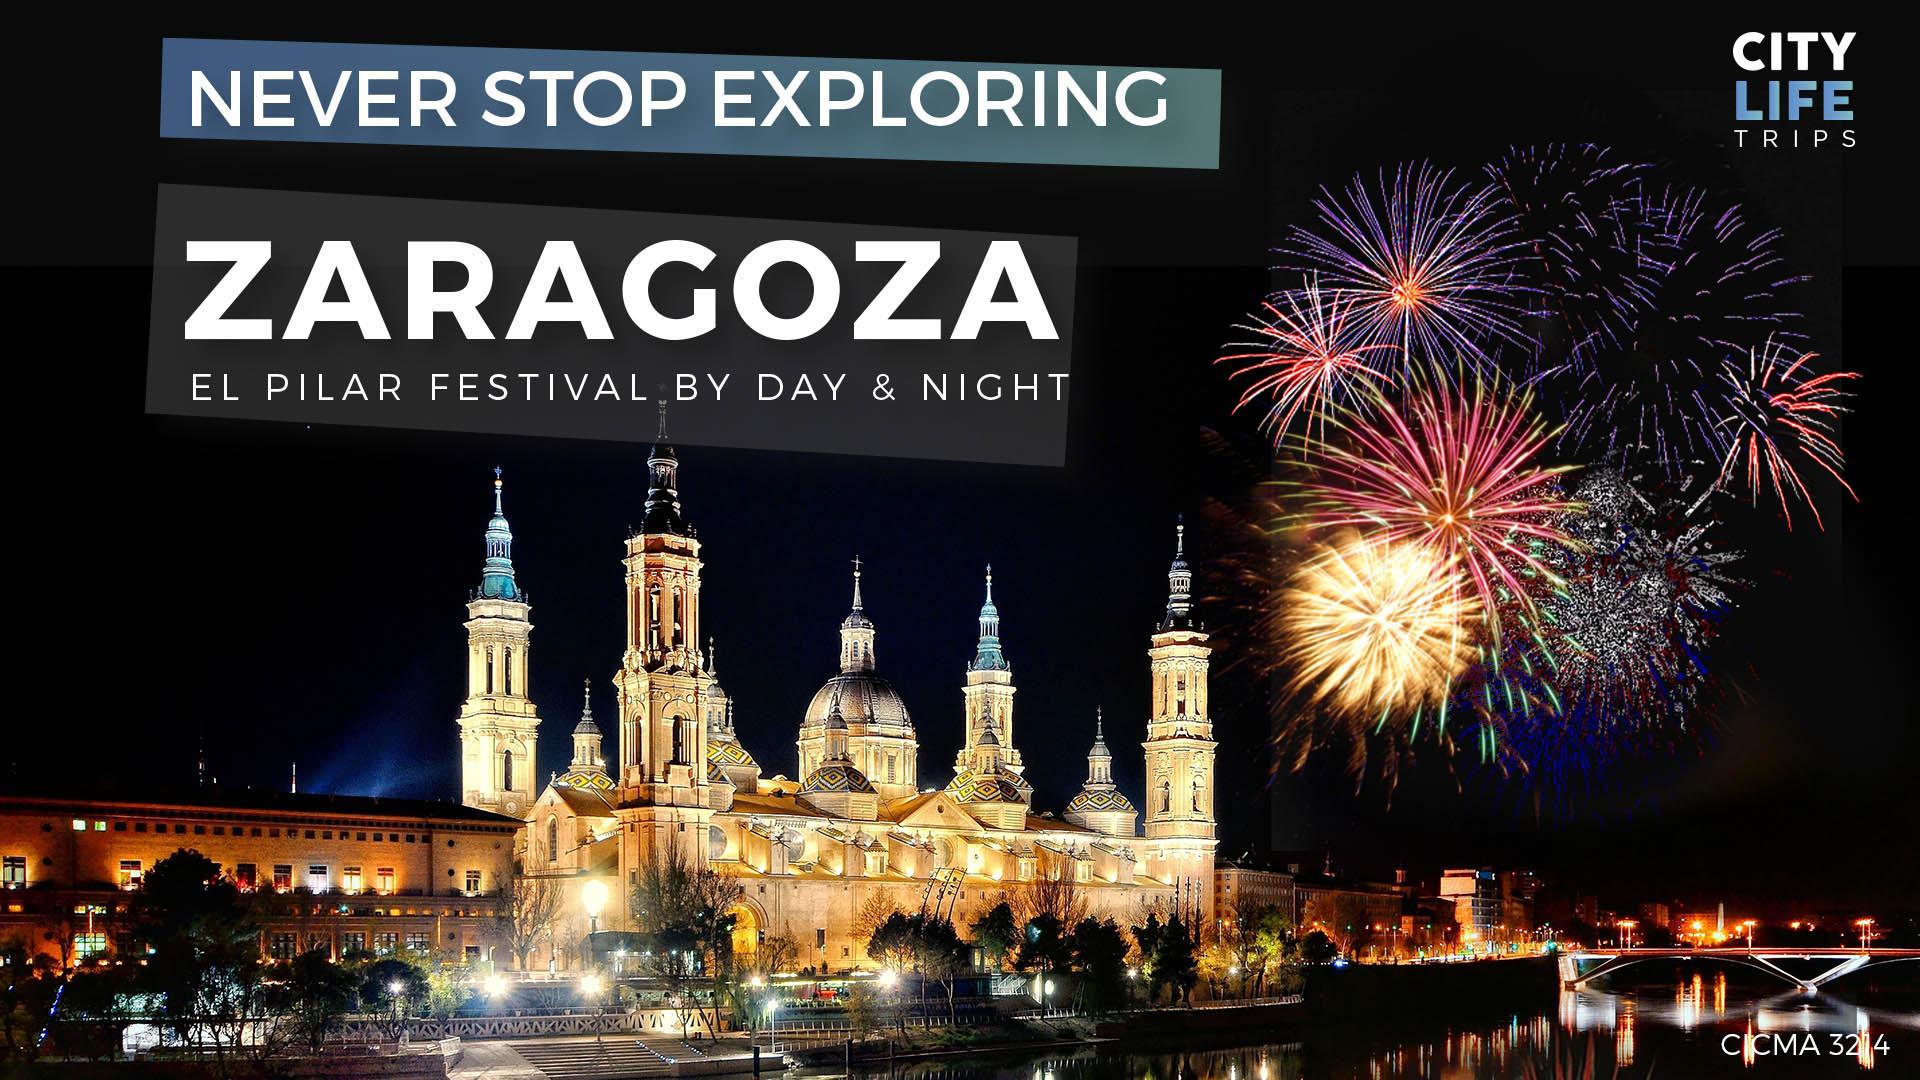 Zaragoza – El Pilar Festival by day & night